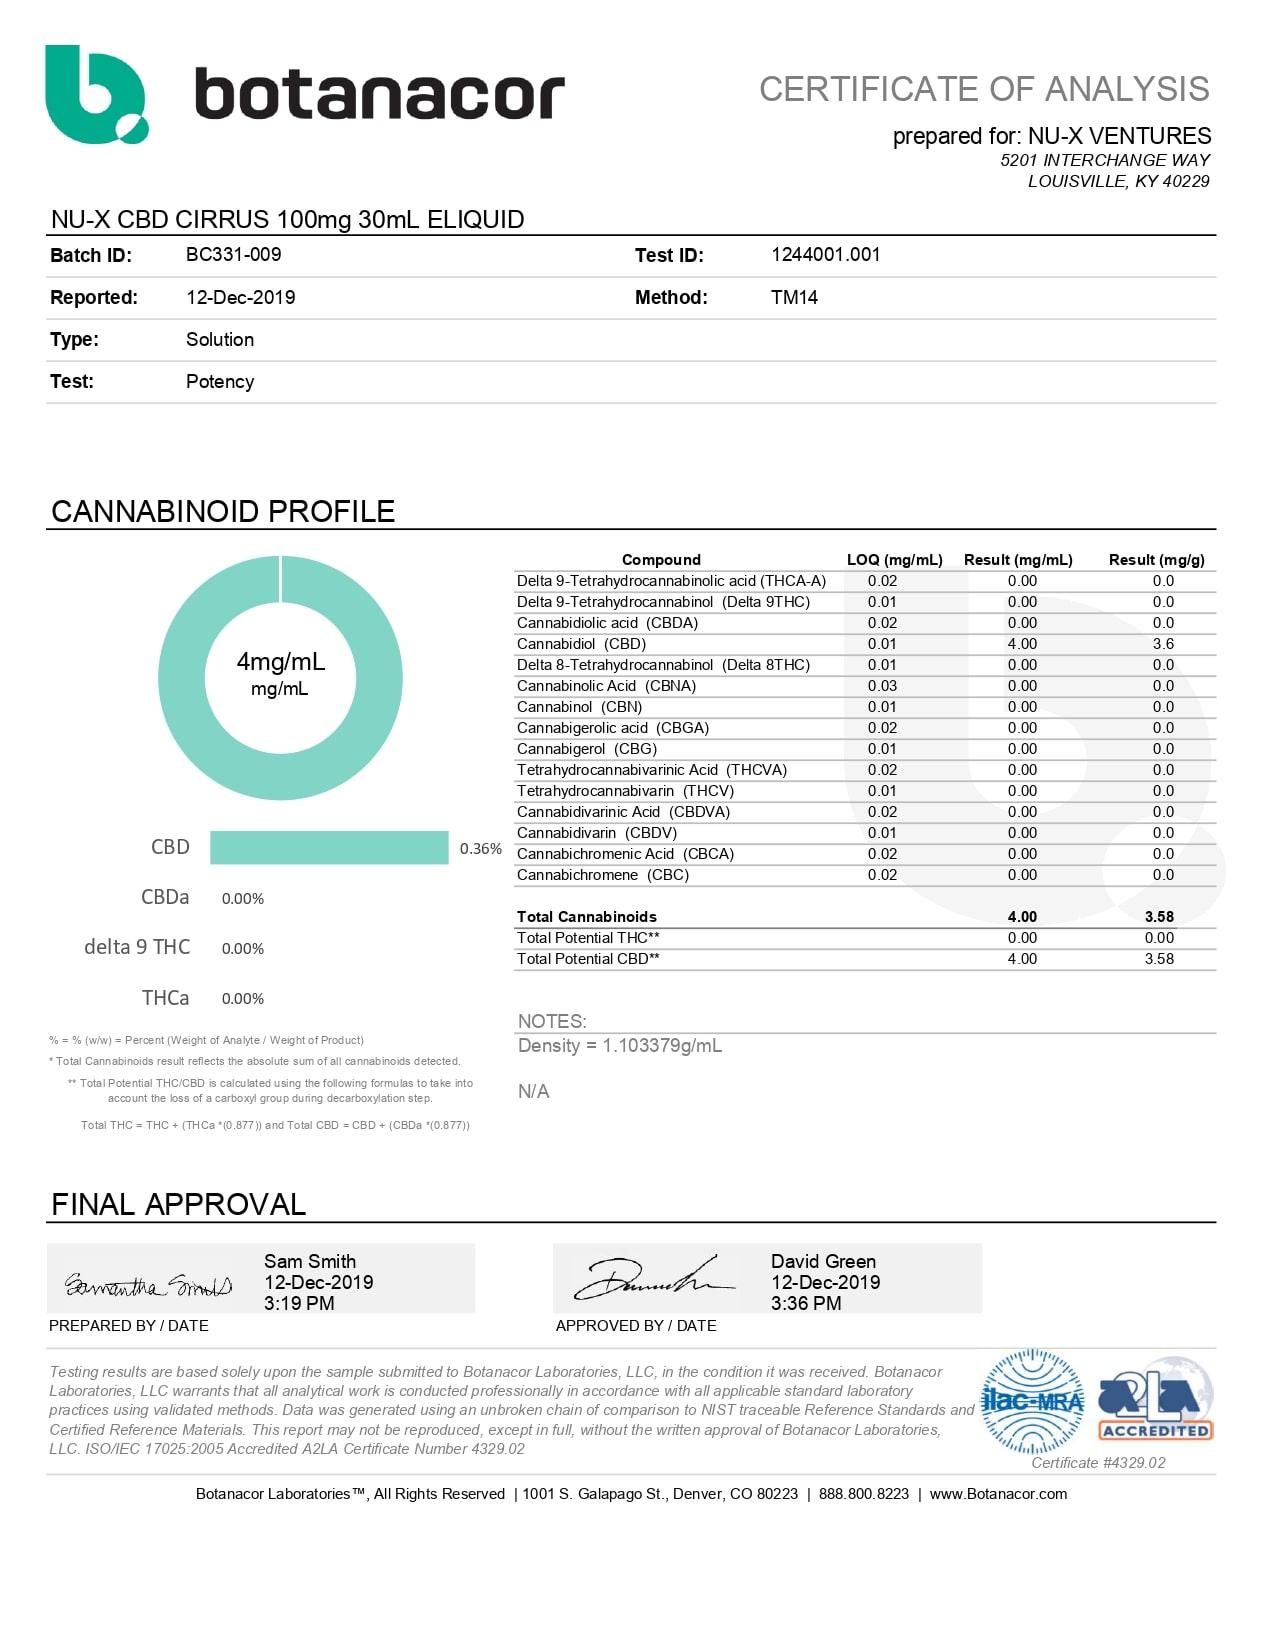 NU-X CBD eLiquid Strawberry French Toast - Cirrus Lab Report 100mg